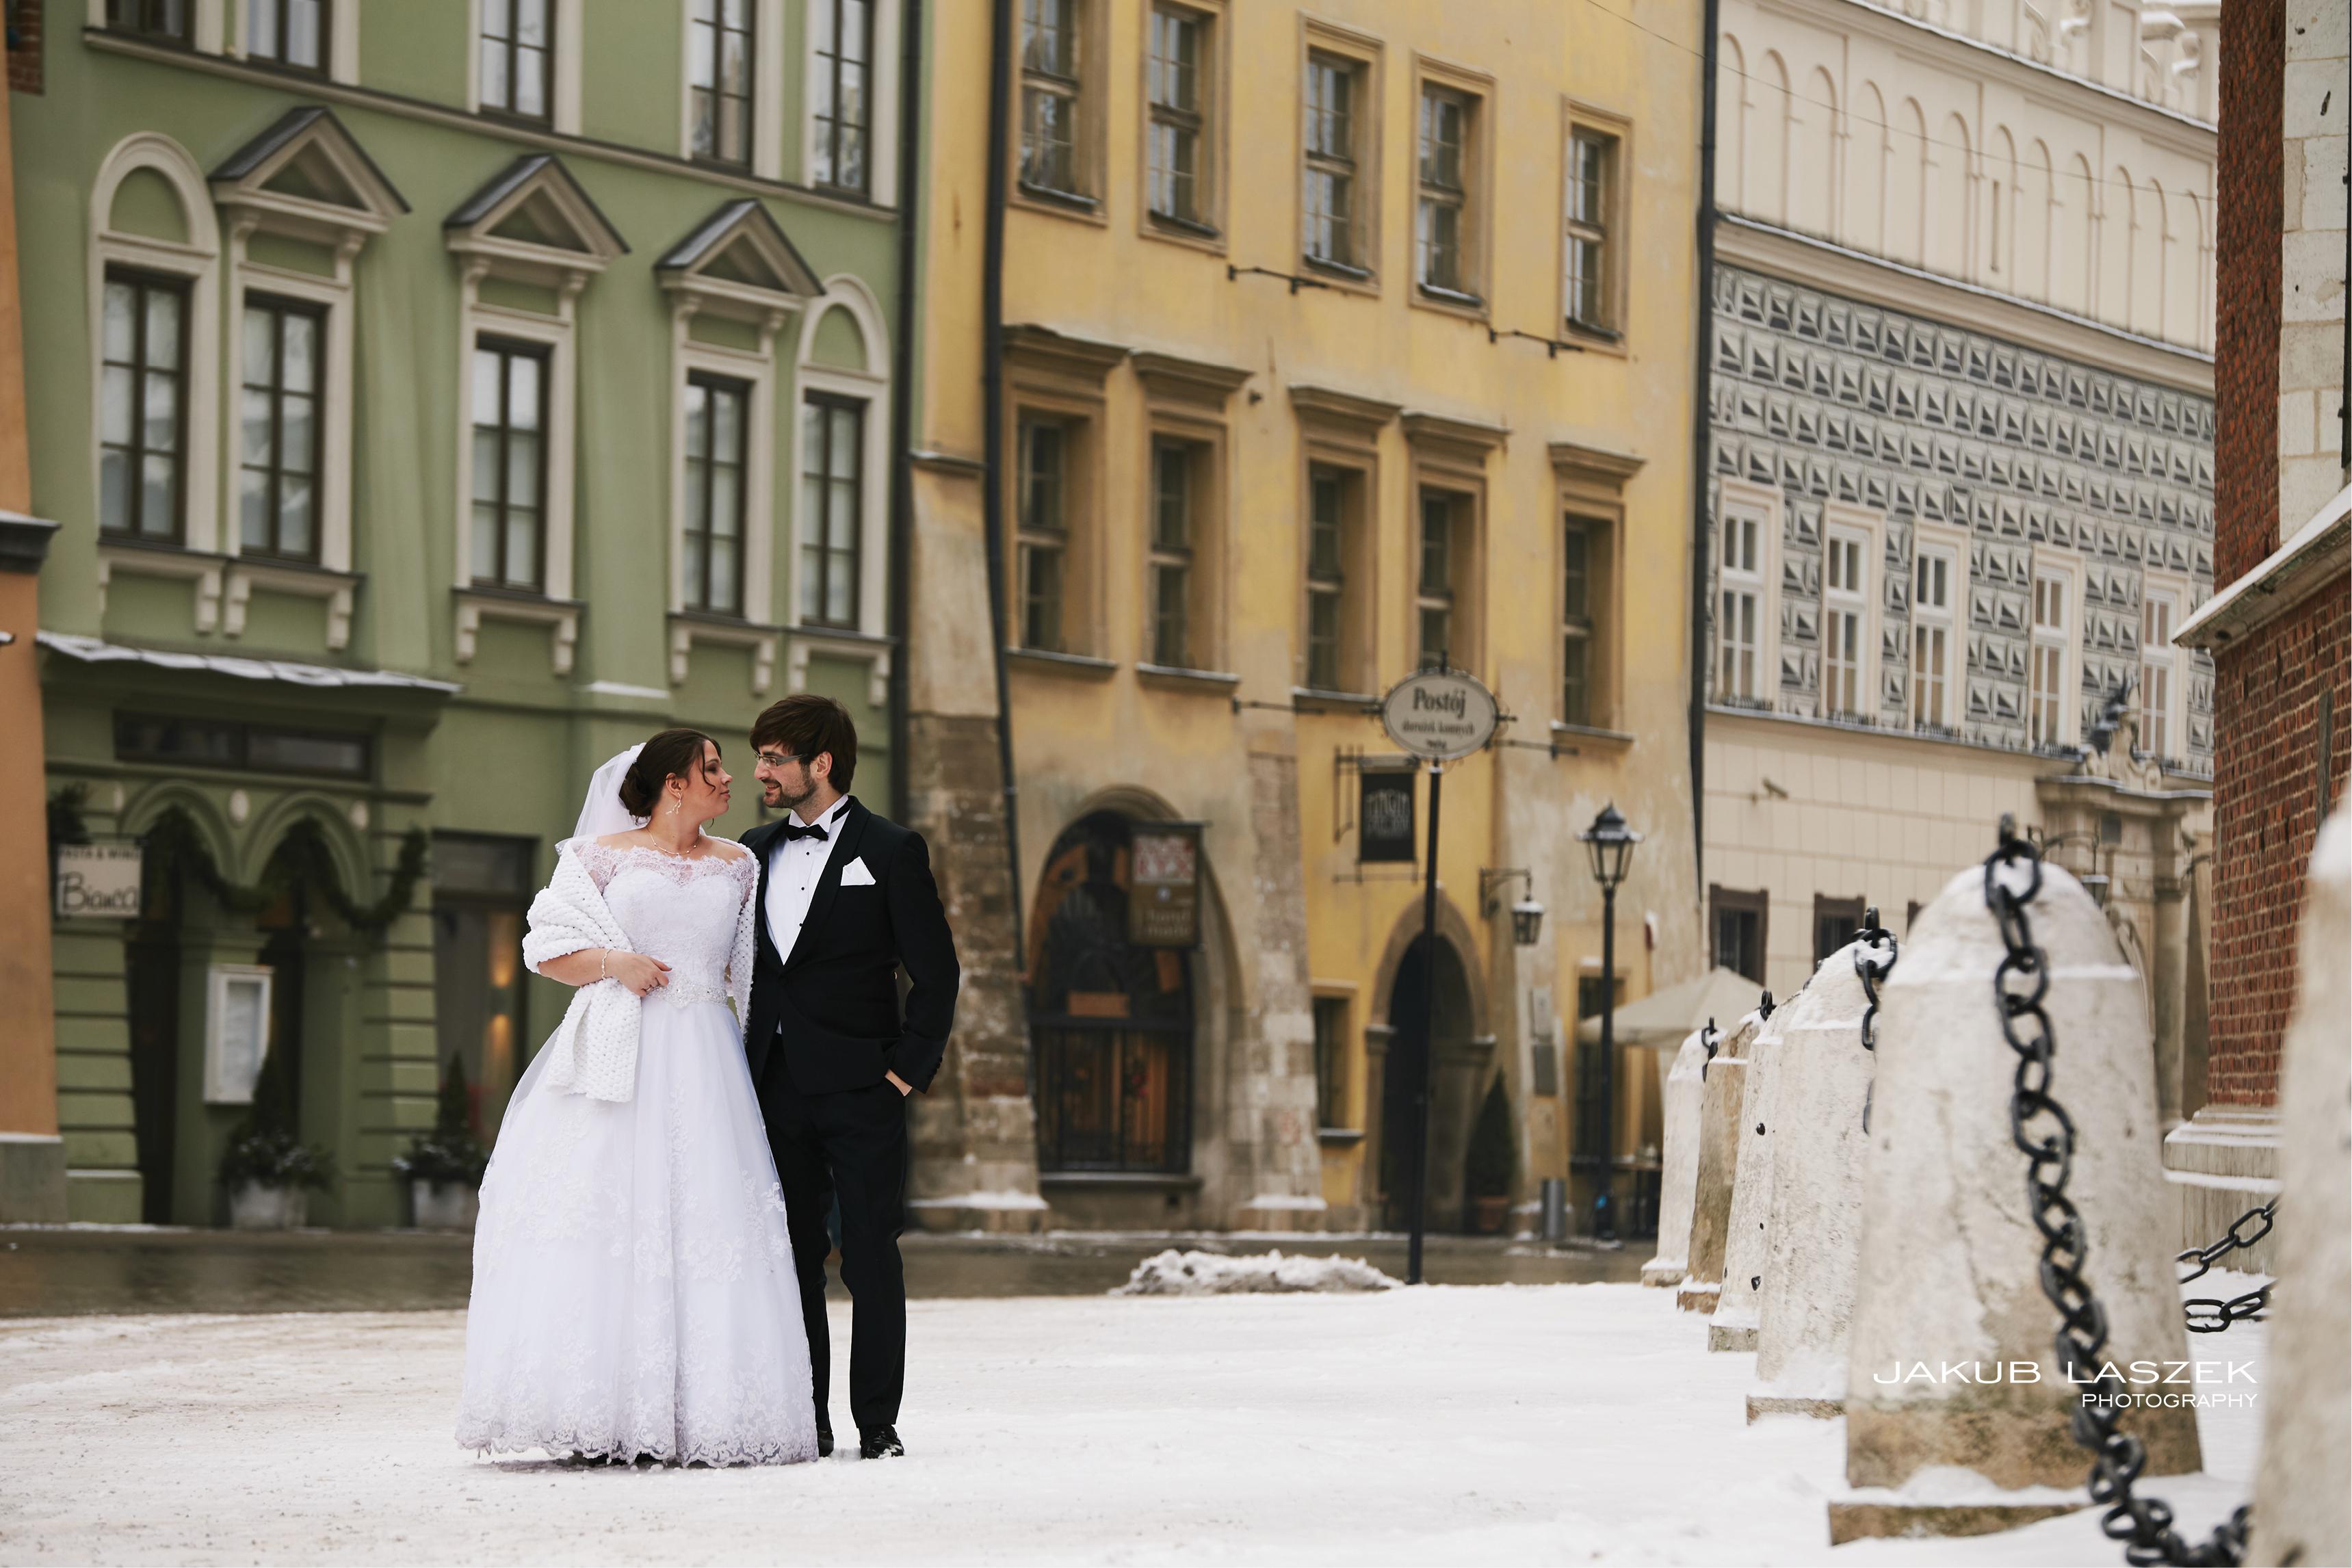 tarnow_fotograf_slubny_wedding_photographer48